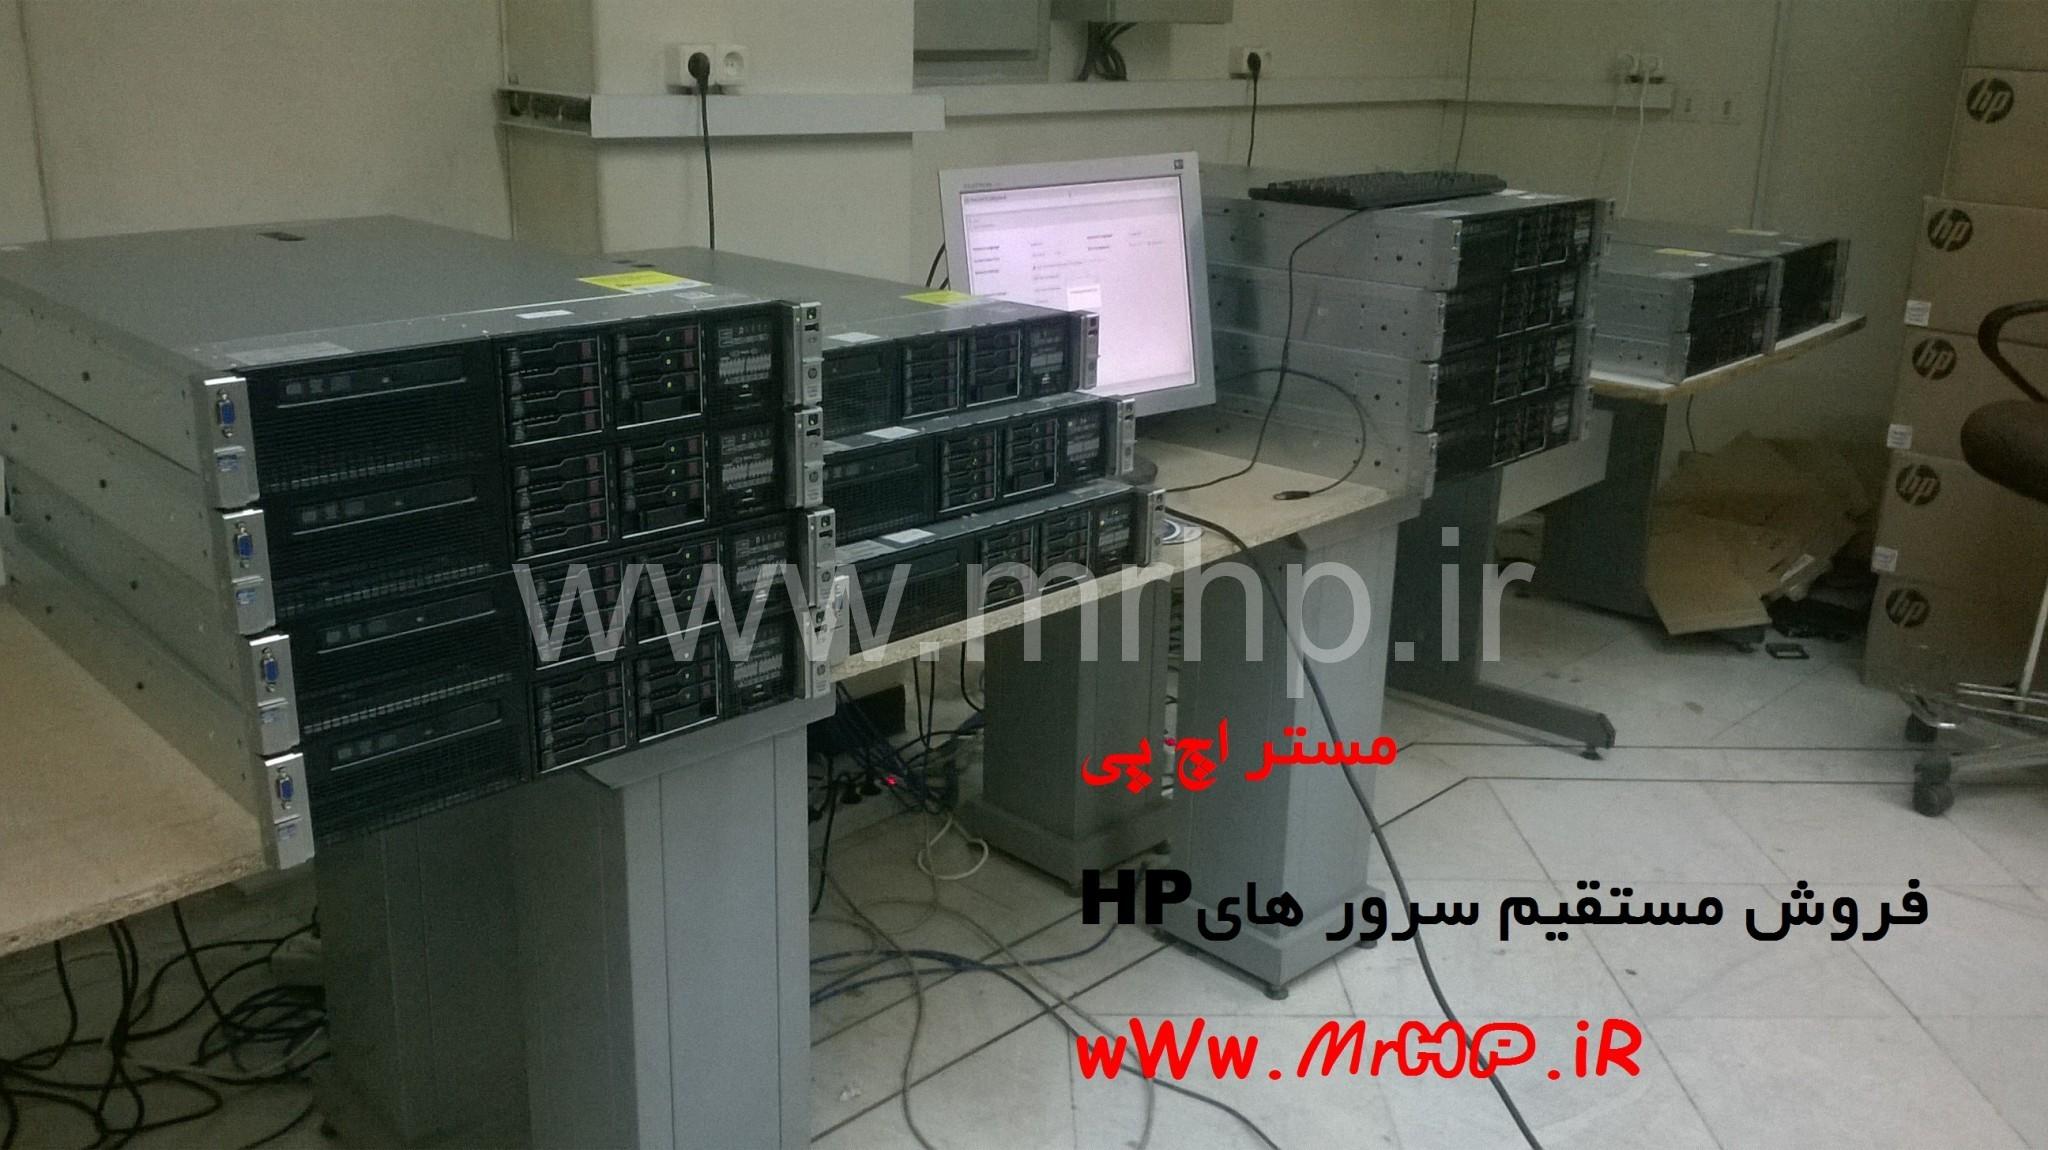 قيمت سرور hp proliant dl380 g9,فروش سرور hp dl380 g9,مشخصات فني سرور hp dl380 g9